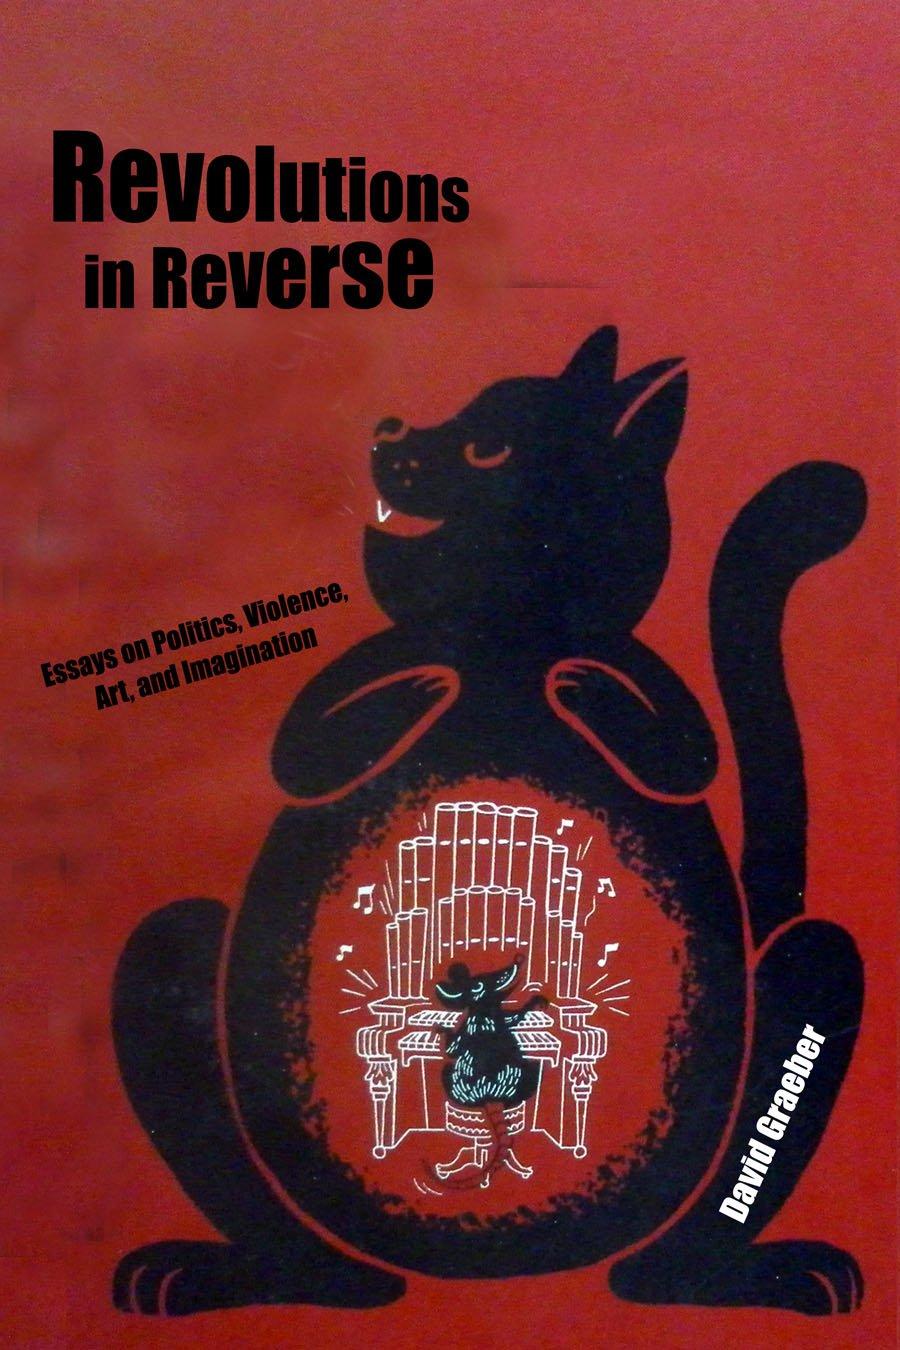 revolutions in reverse - book cover.jpg